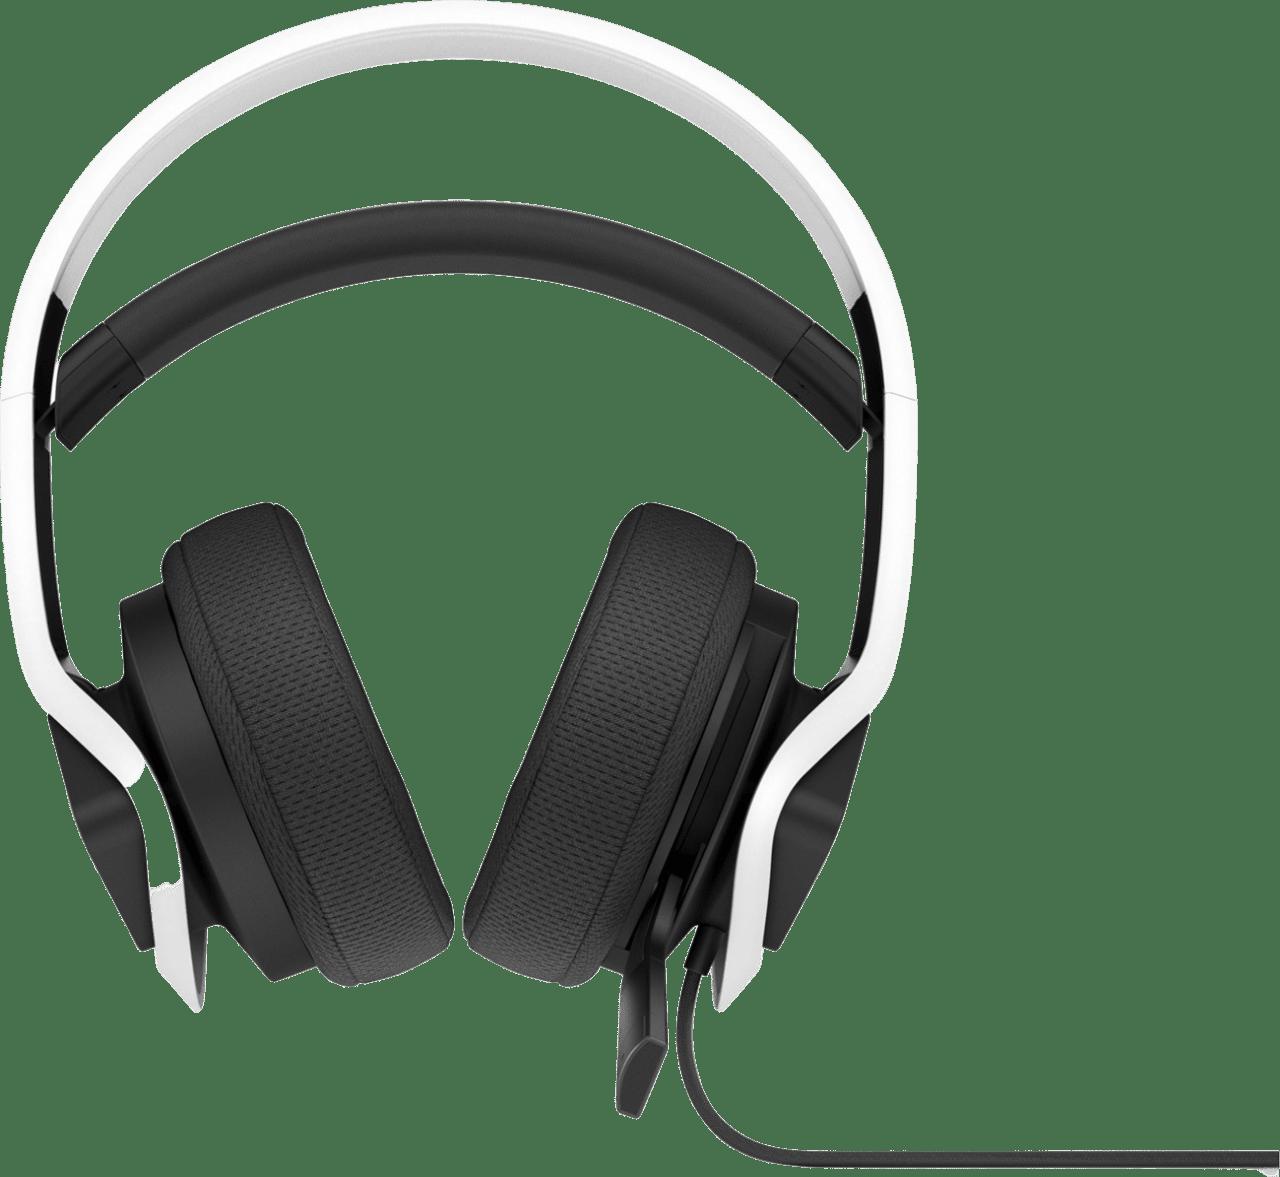 Weiß HP Omen Mindframe 2 Over-Ear-Gaming-Kopfhörer.2